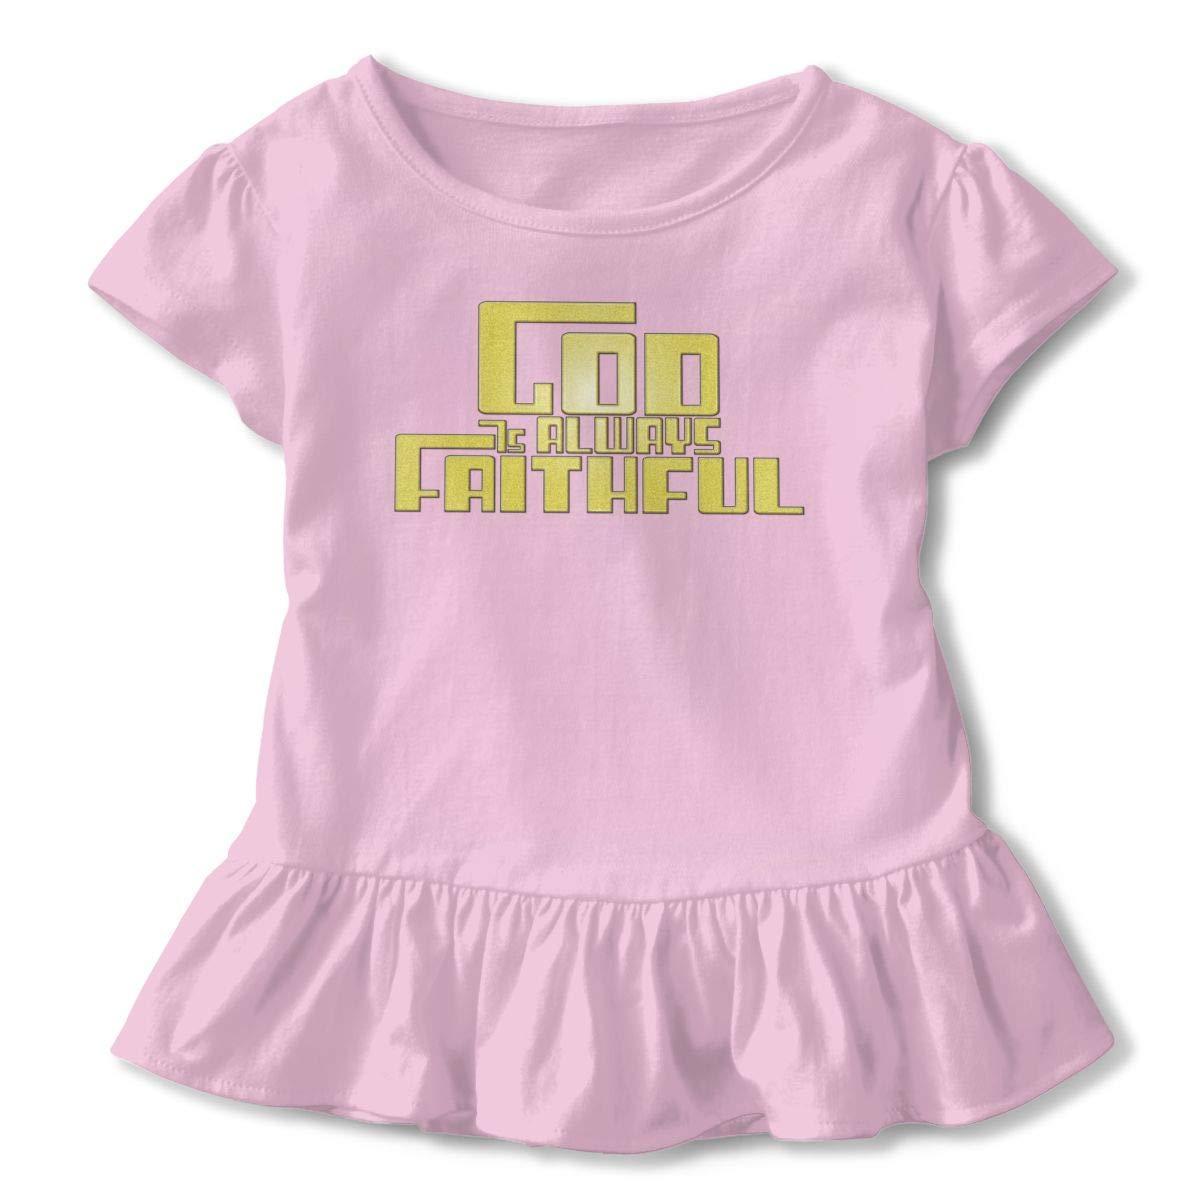 God is Always Faithful Toddler Baby Girl Ruffle Short Sleeve T-Shirt Cute Cotton T Shirts